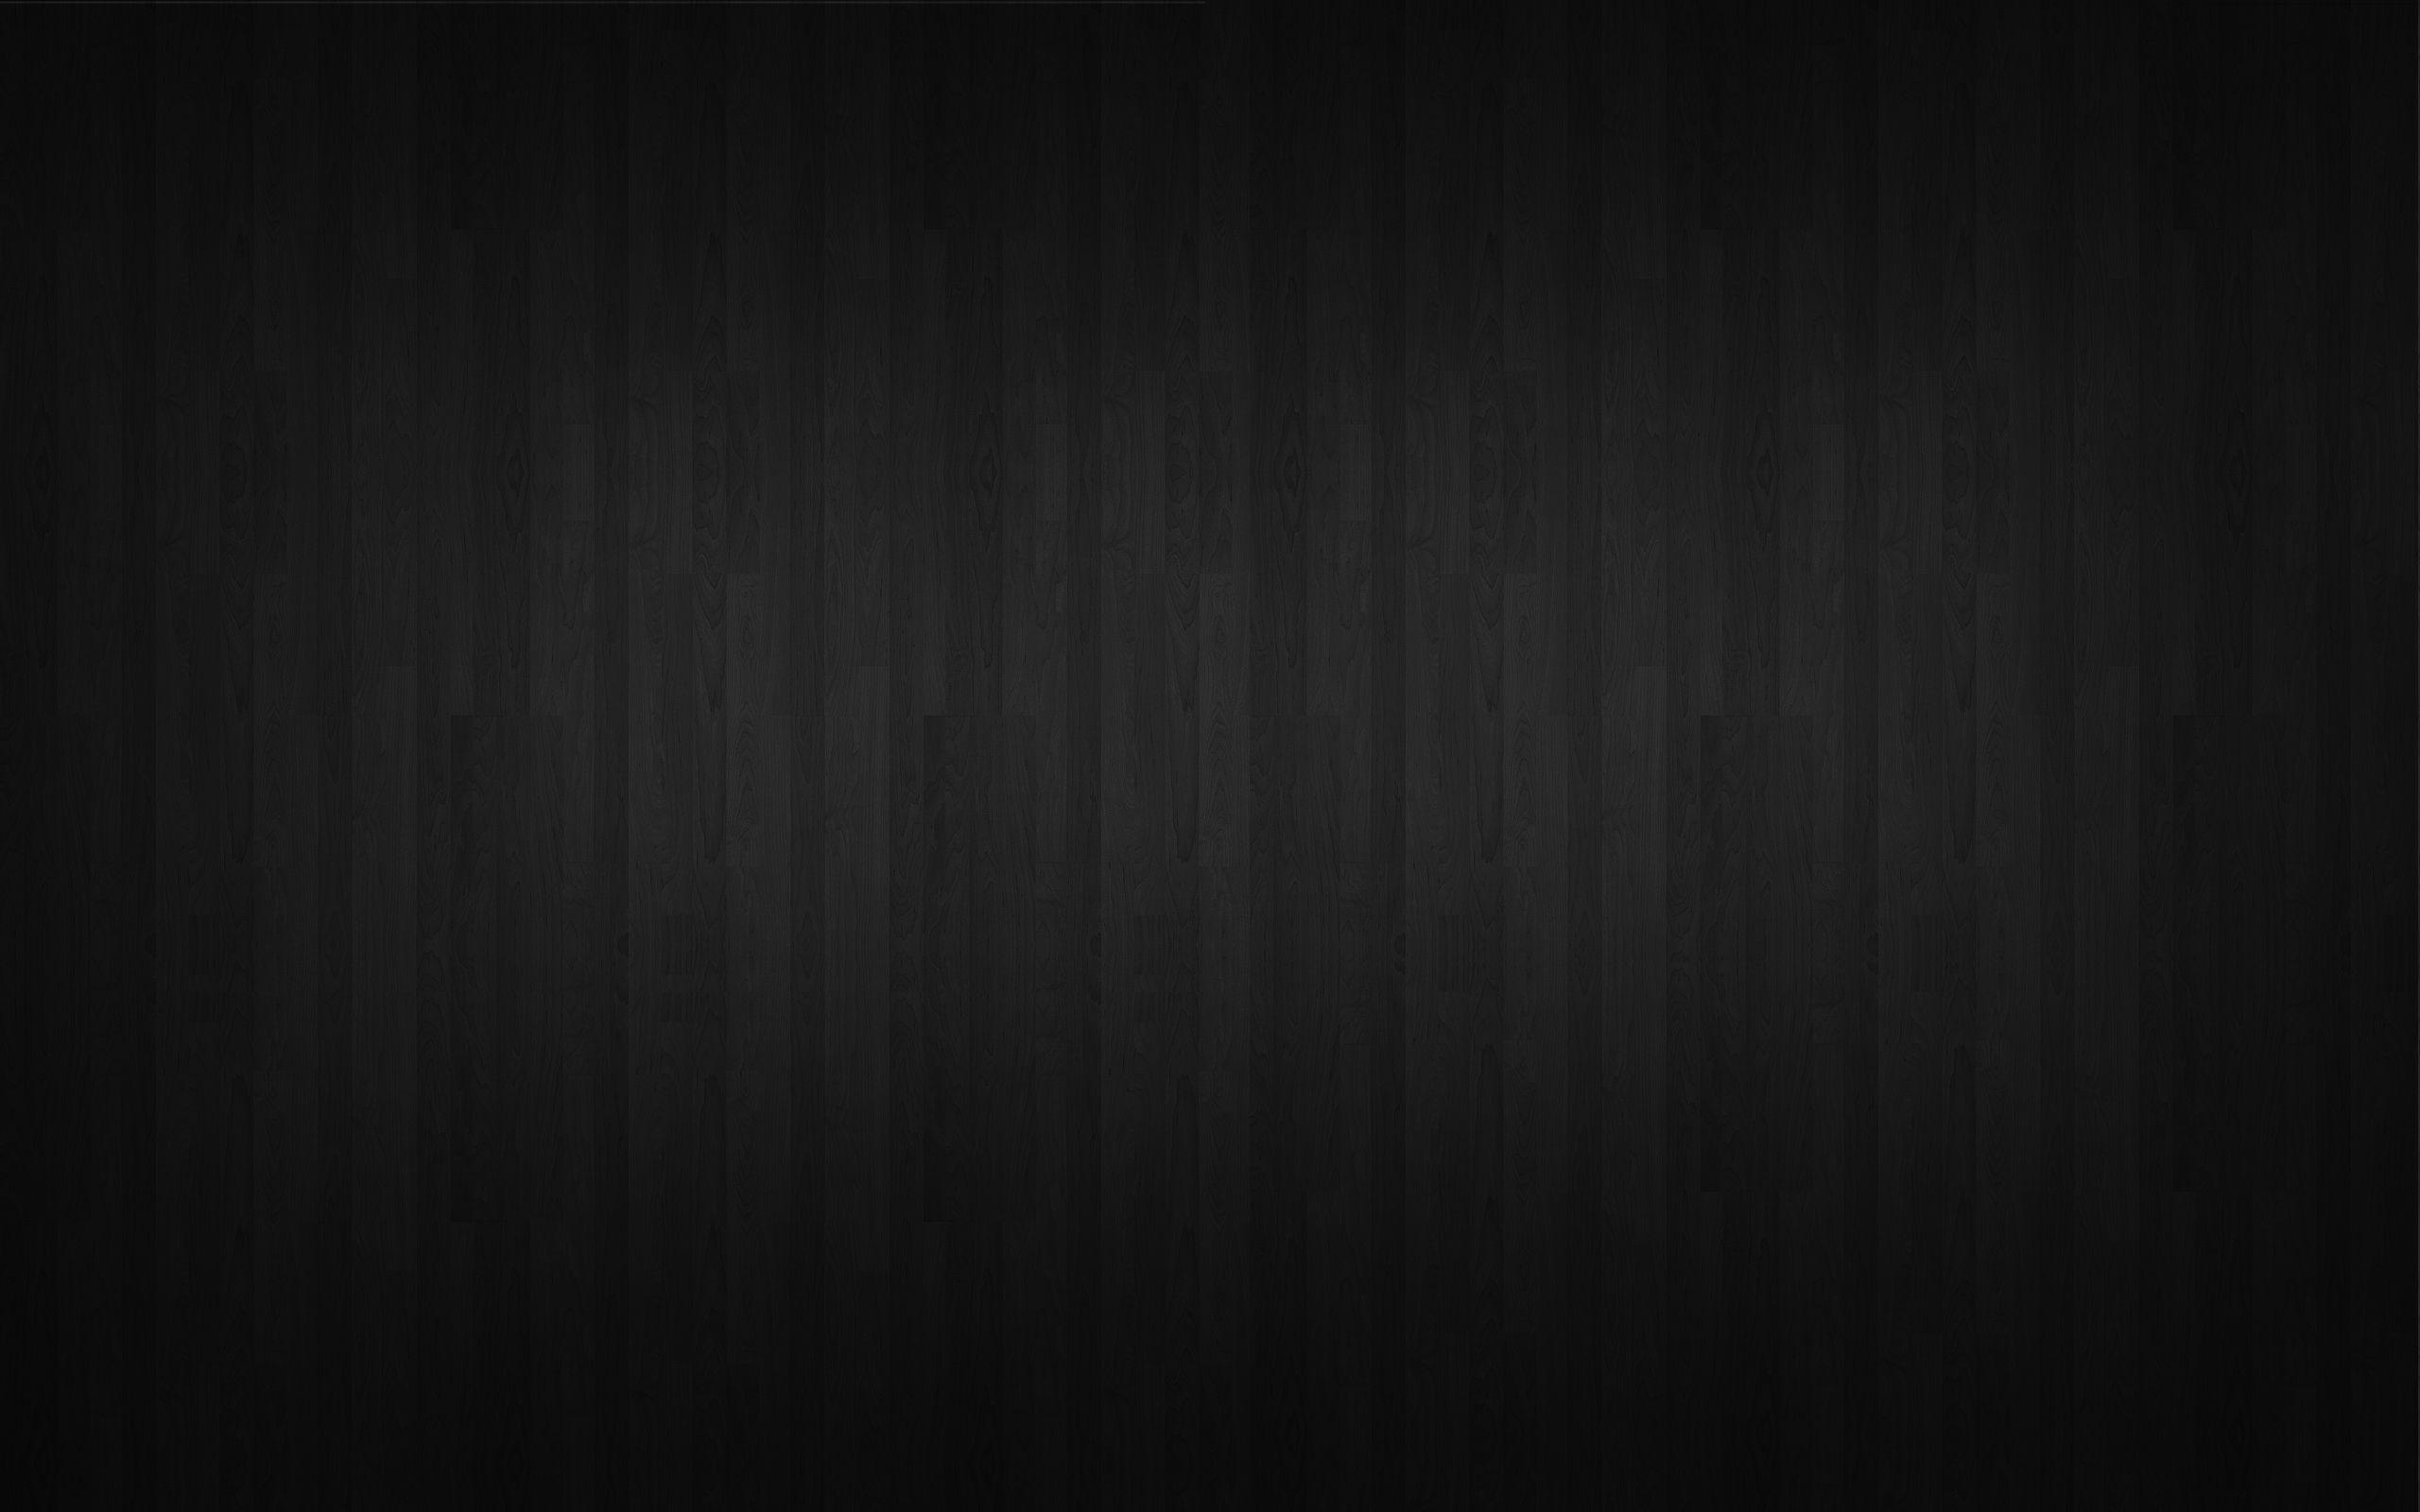 2560x1440 Black Wallpapers On Wallpaperdog